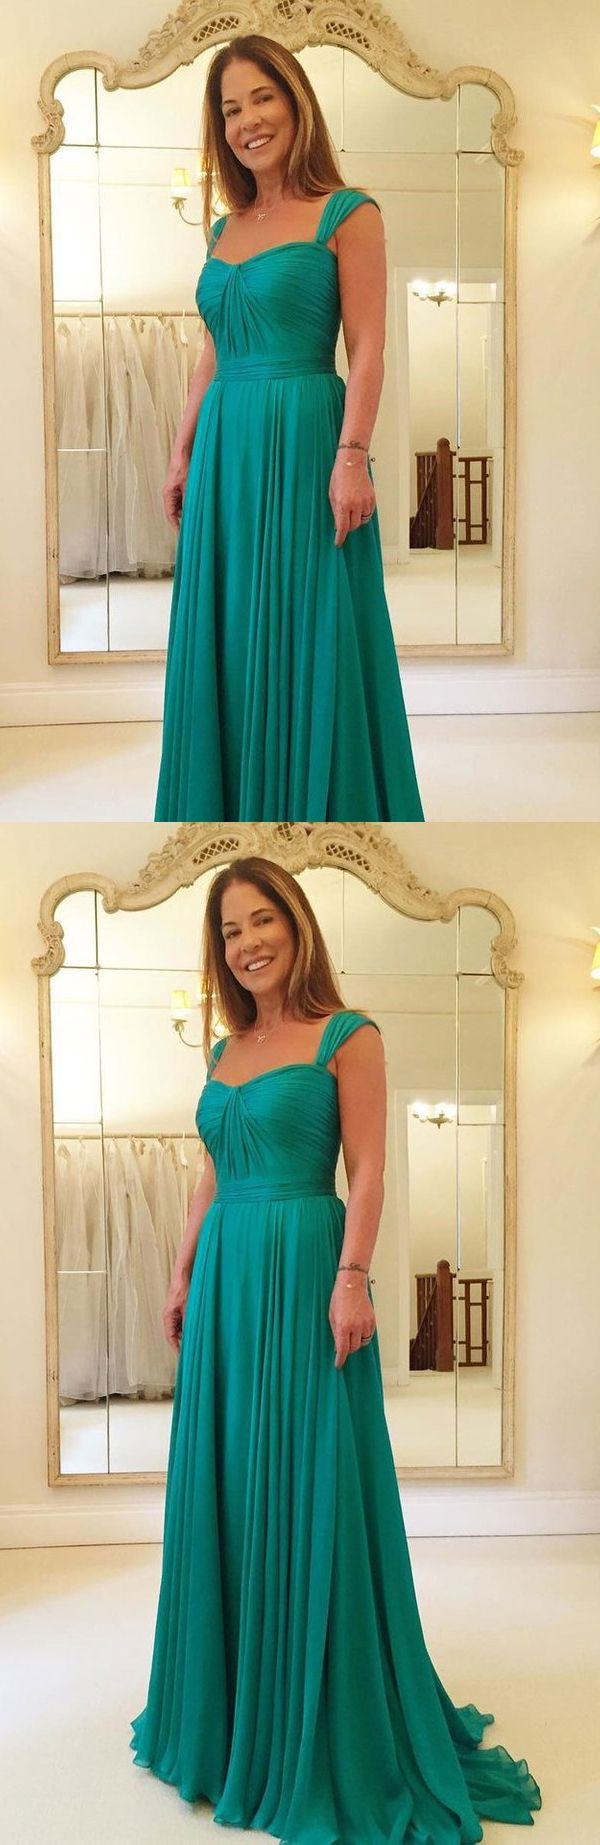 A line emerald green chiffon long cheap prom dresses formal dress